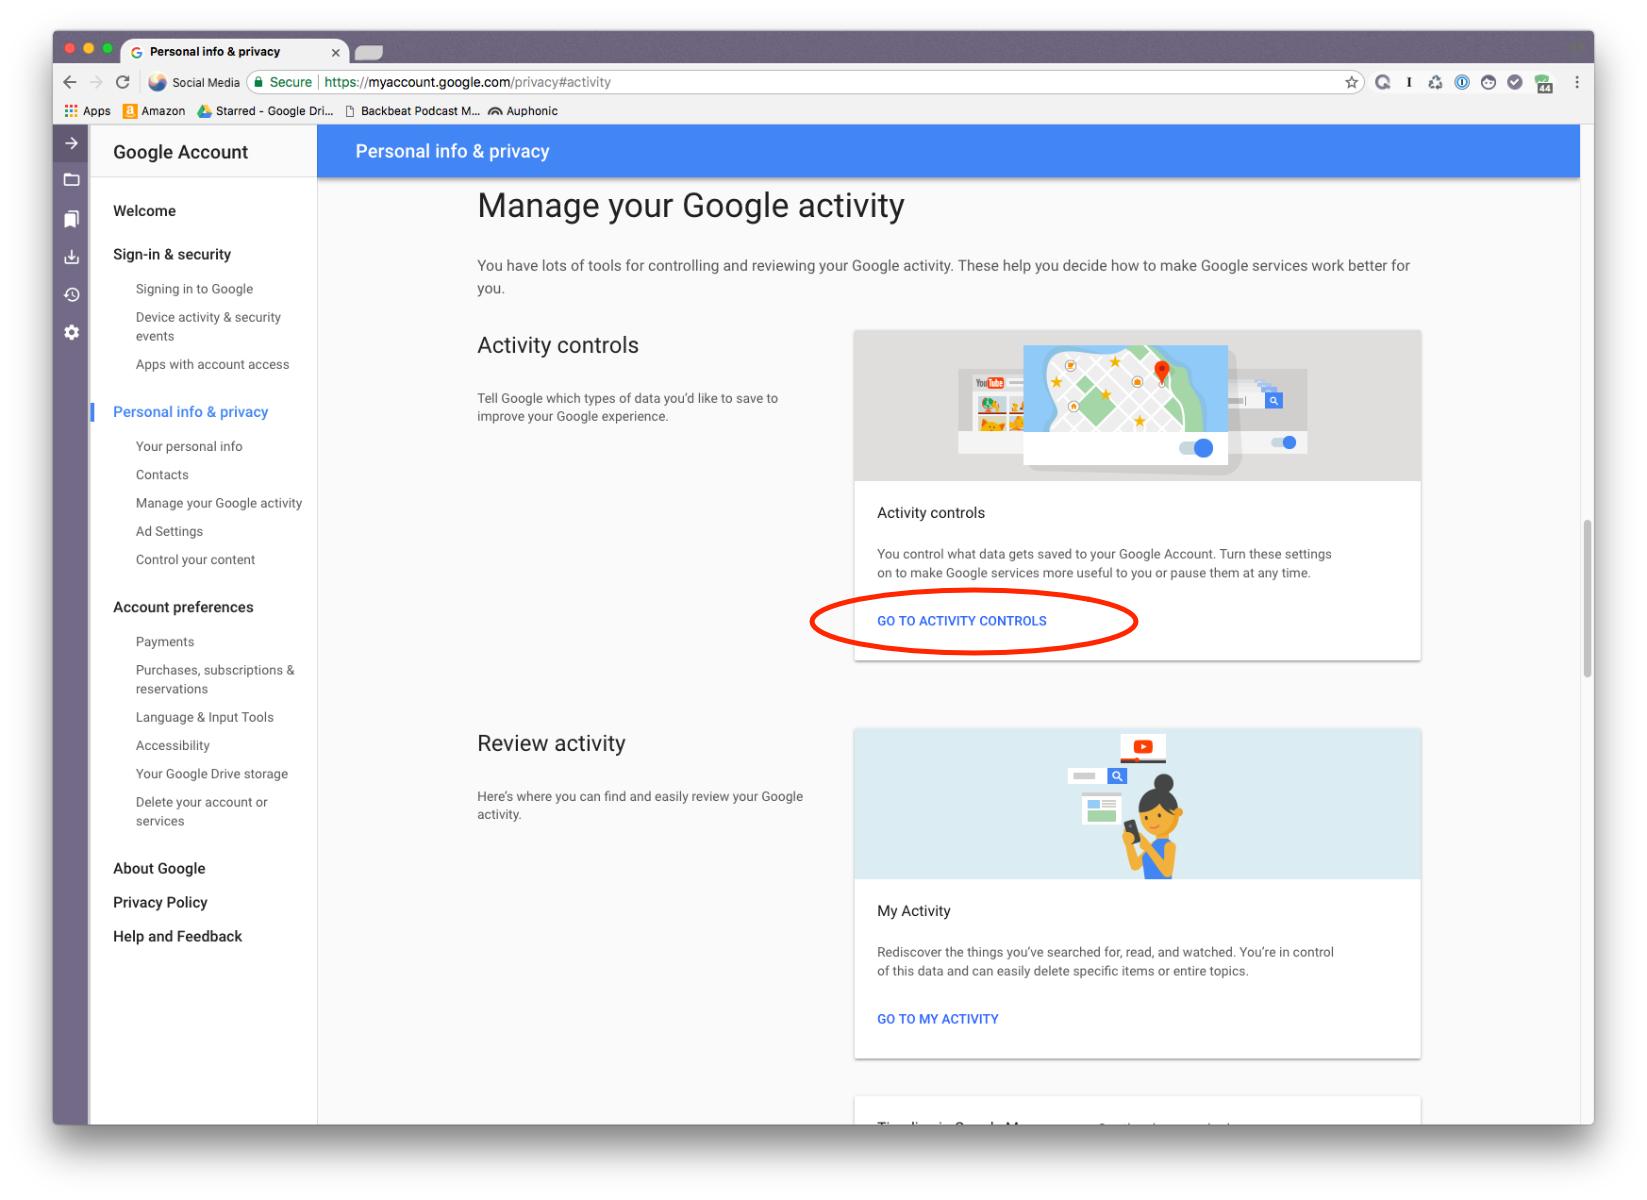 Google Activity Controls option